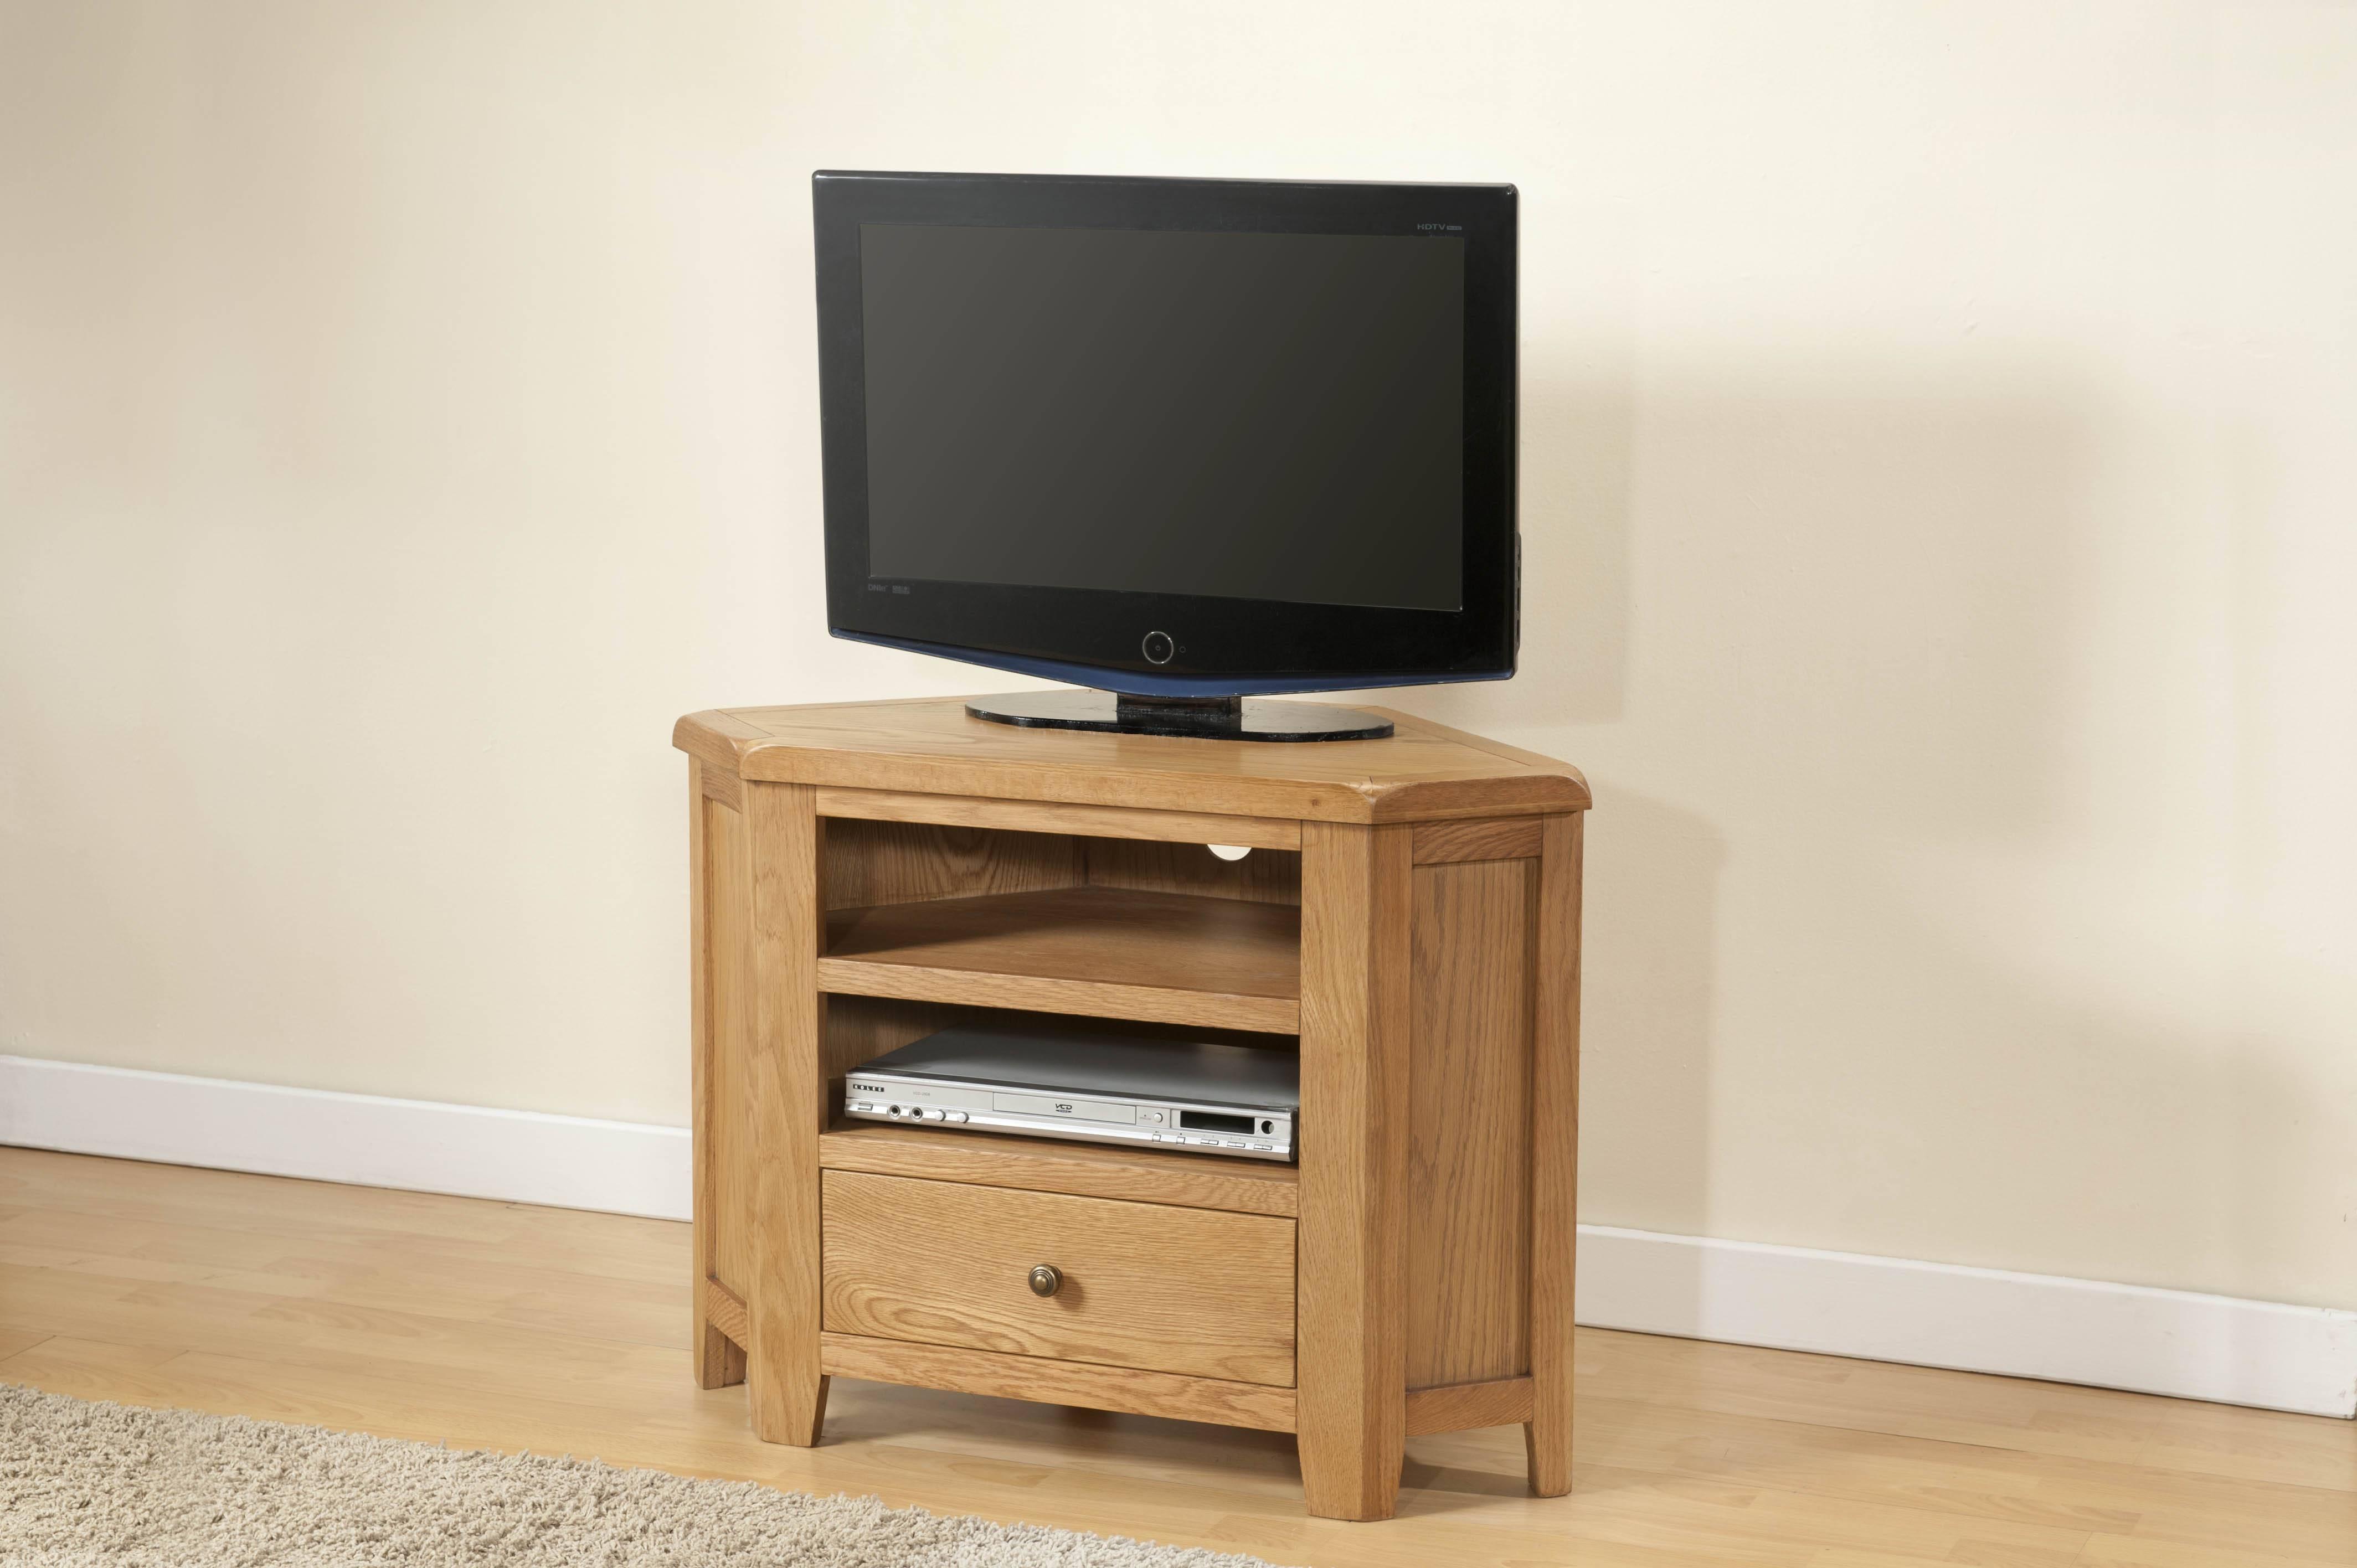 Shrewsbury Oak Corner Tv Unit | Oak Furniture Solutions regarding Oak Corner Tv Cabinets (Image 13 of 15)